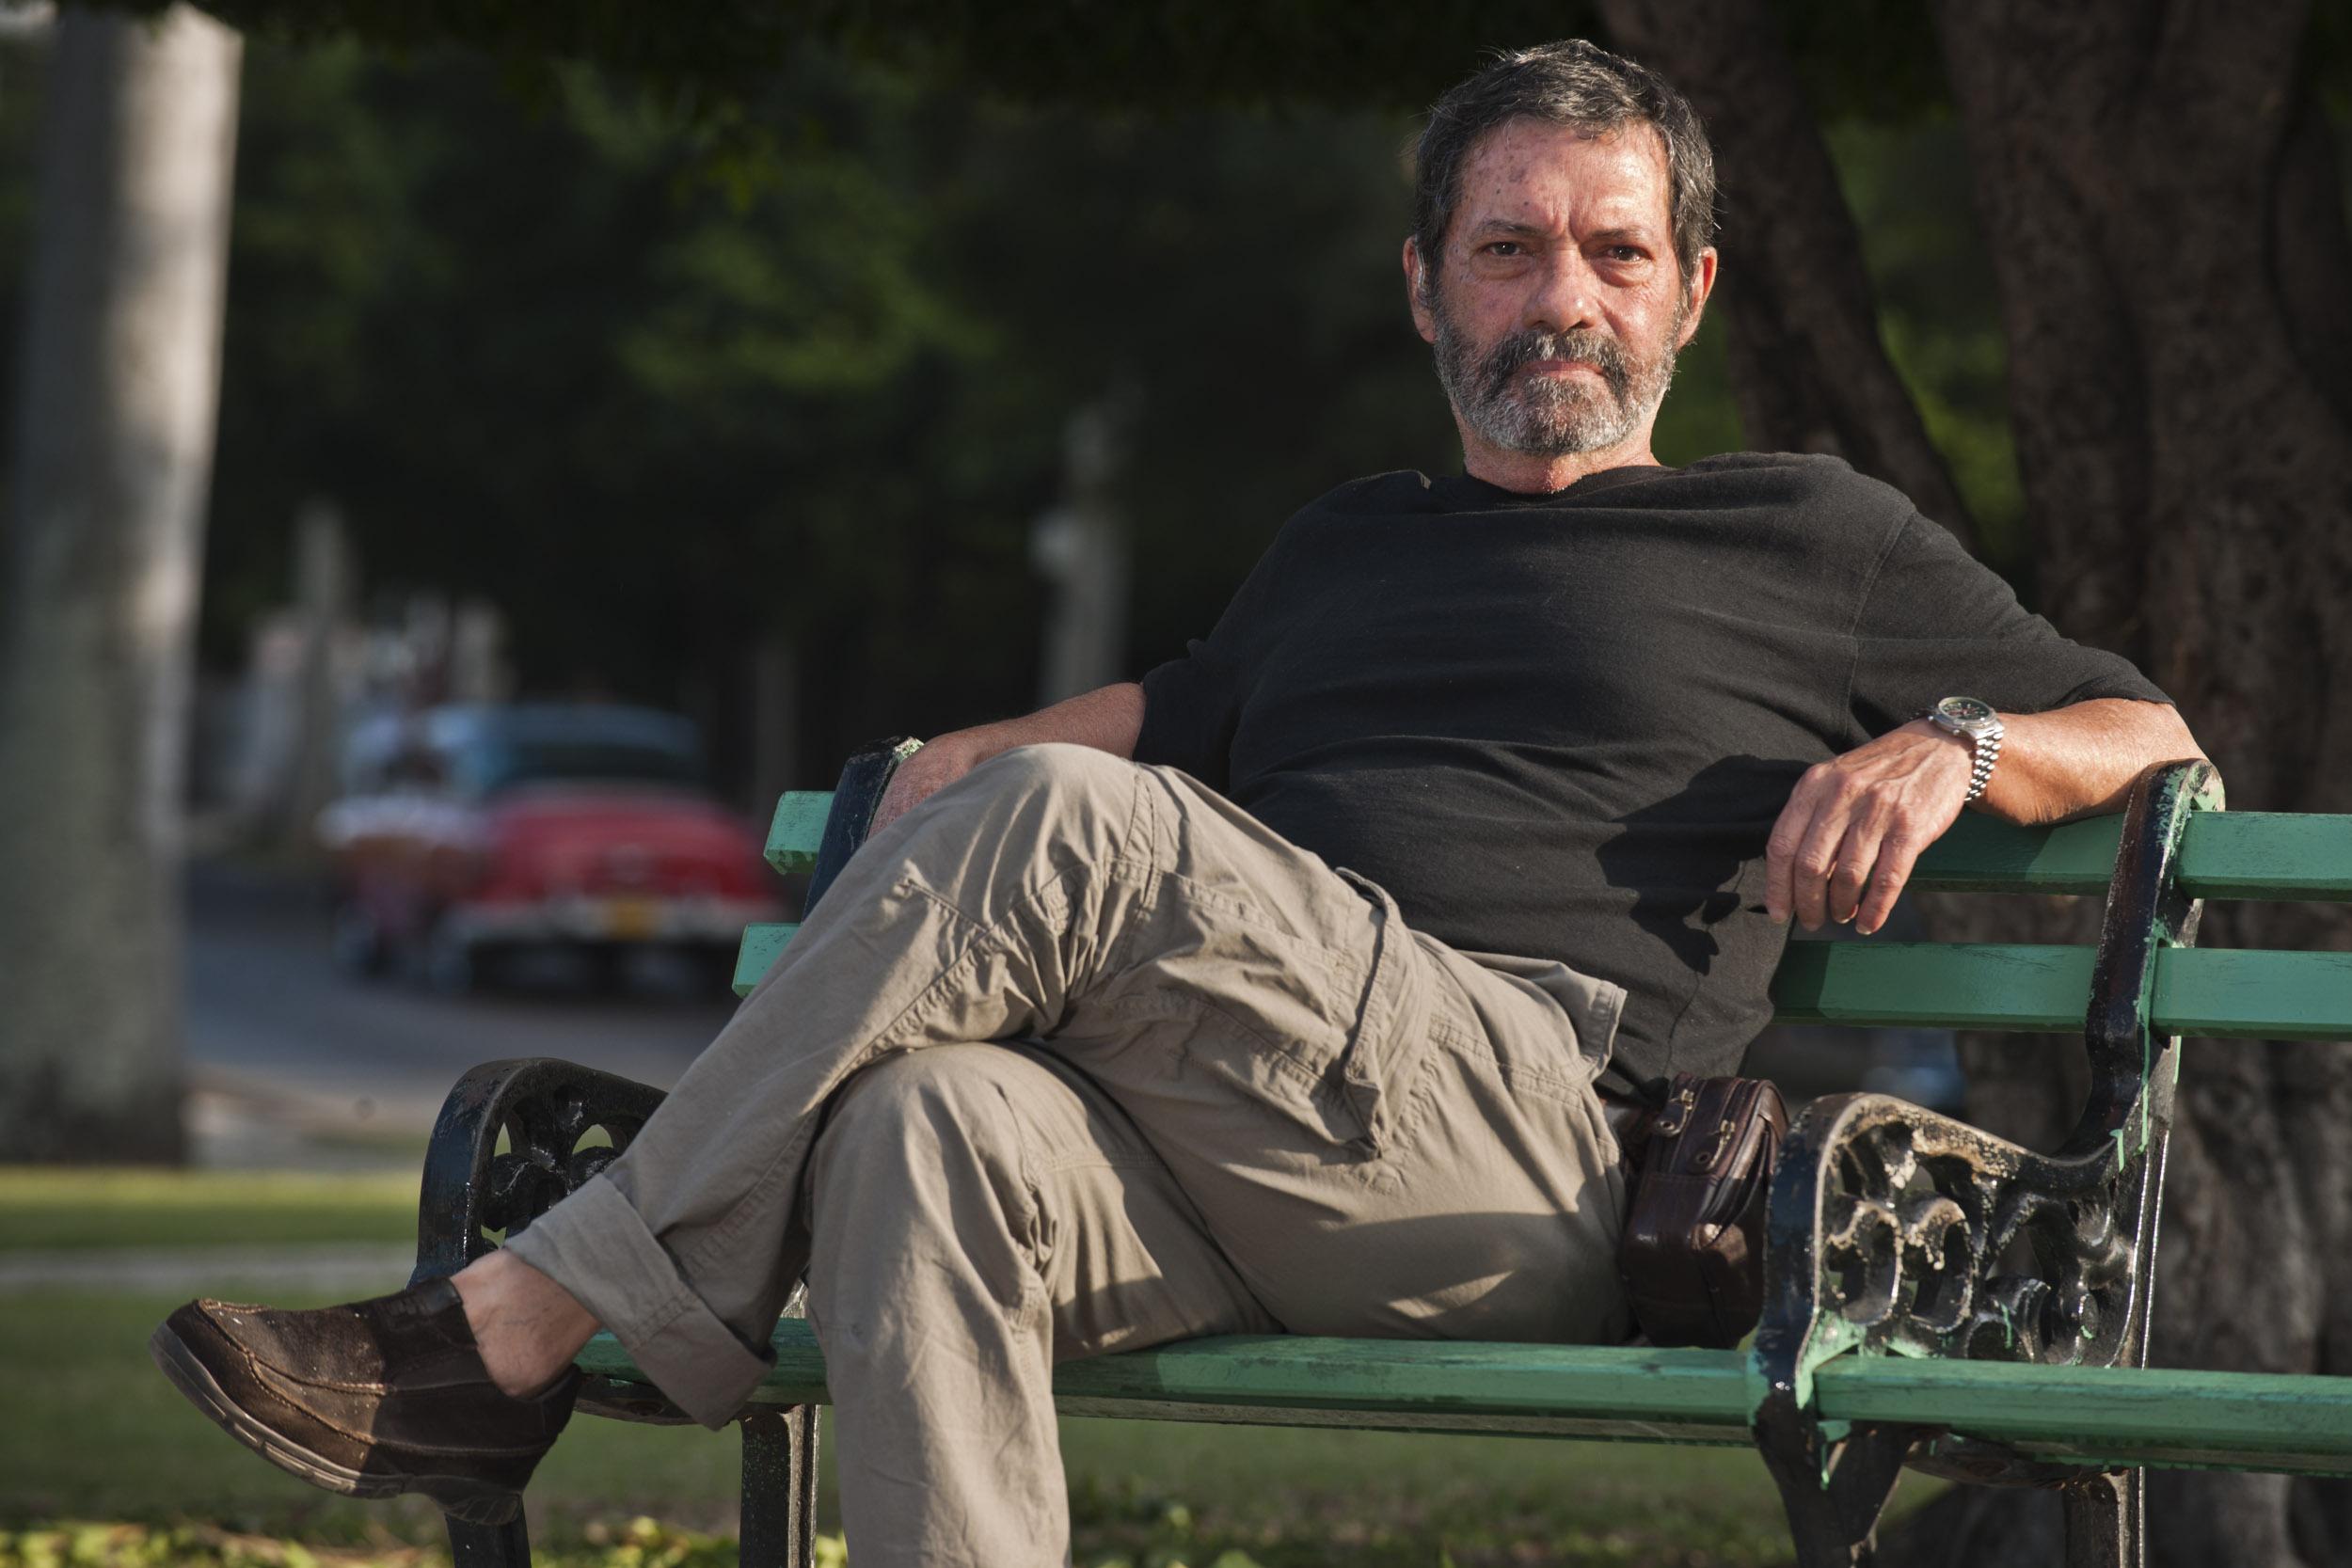 Juan Carlos Tabío, filmmaker - Illuminated Cuba - Hector Garrido, Aerial and human photography